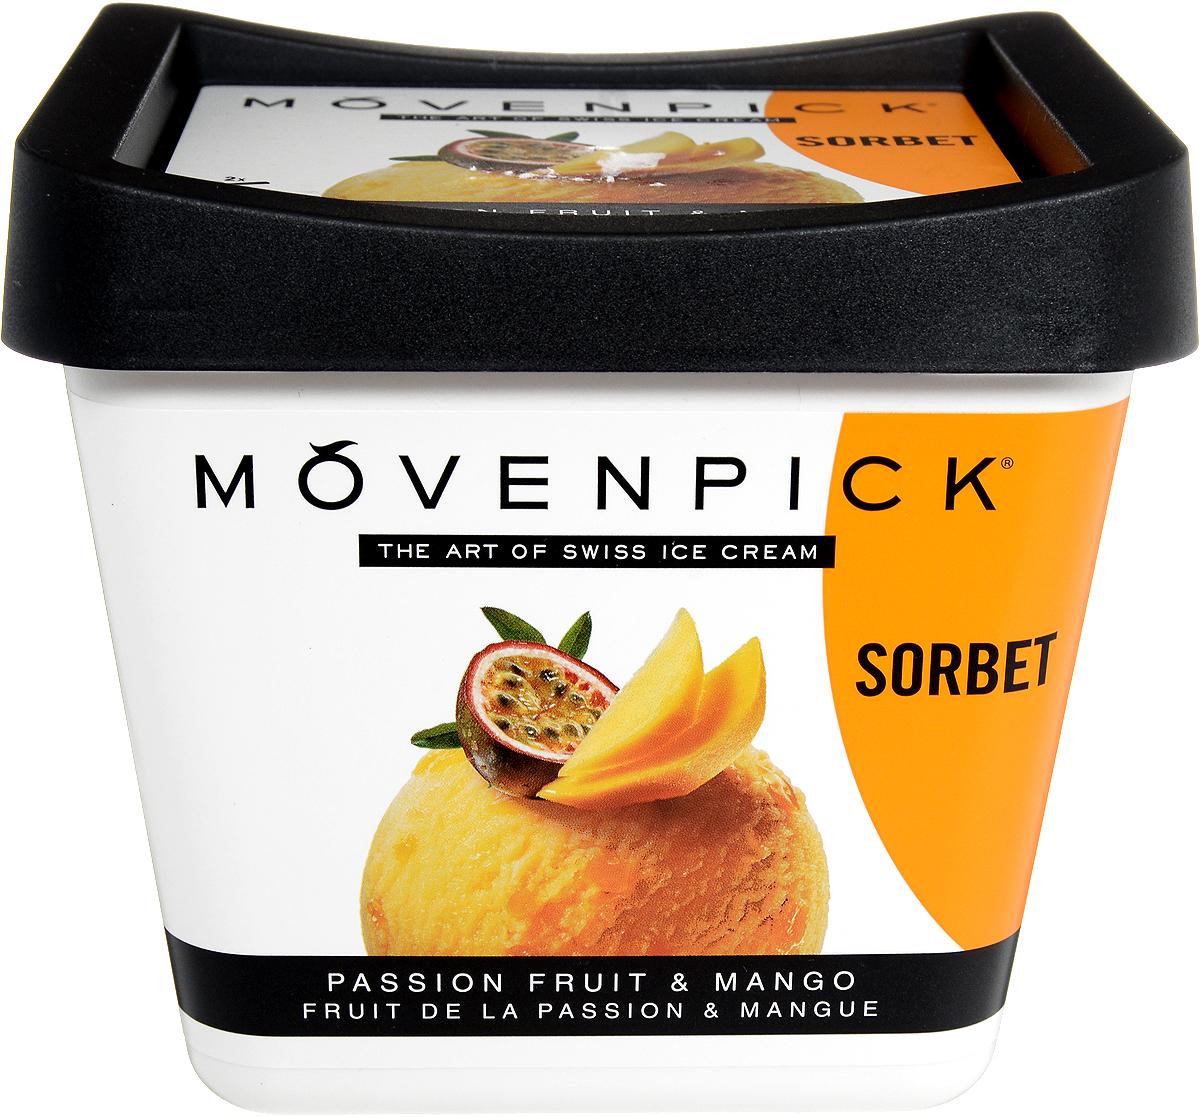 Movenpick Сорбет Маракуйя с кусочками манго, 900 мл movenpick мороженое фисташковое 900 мл